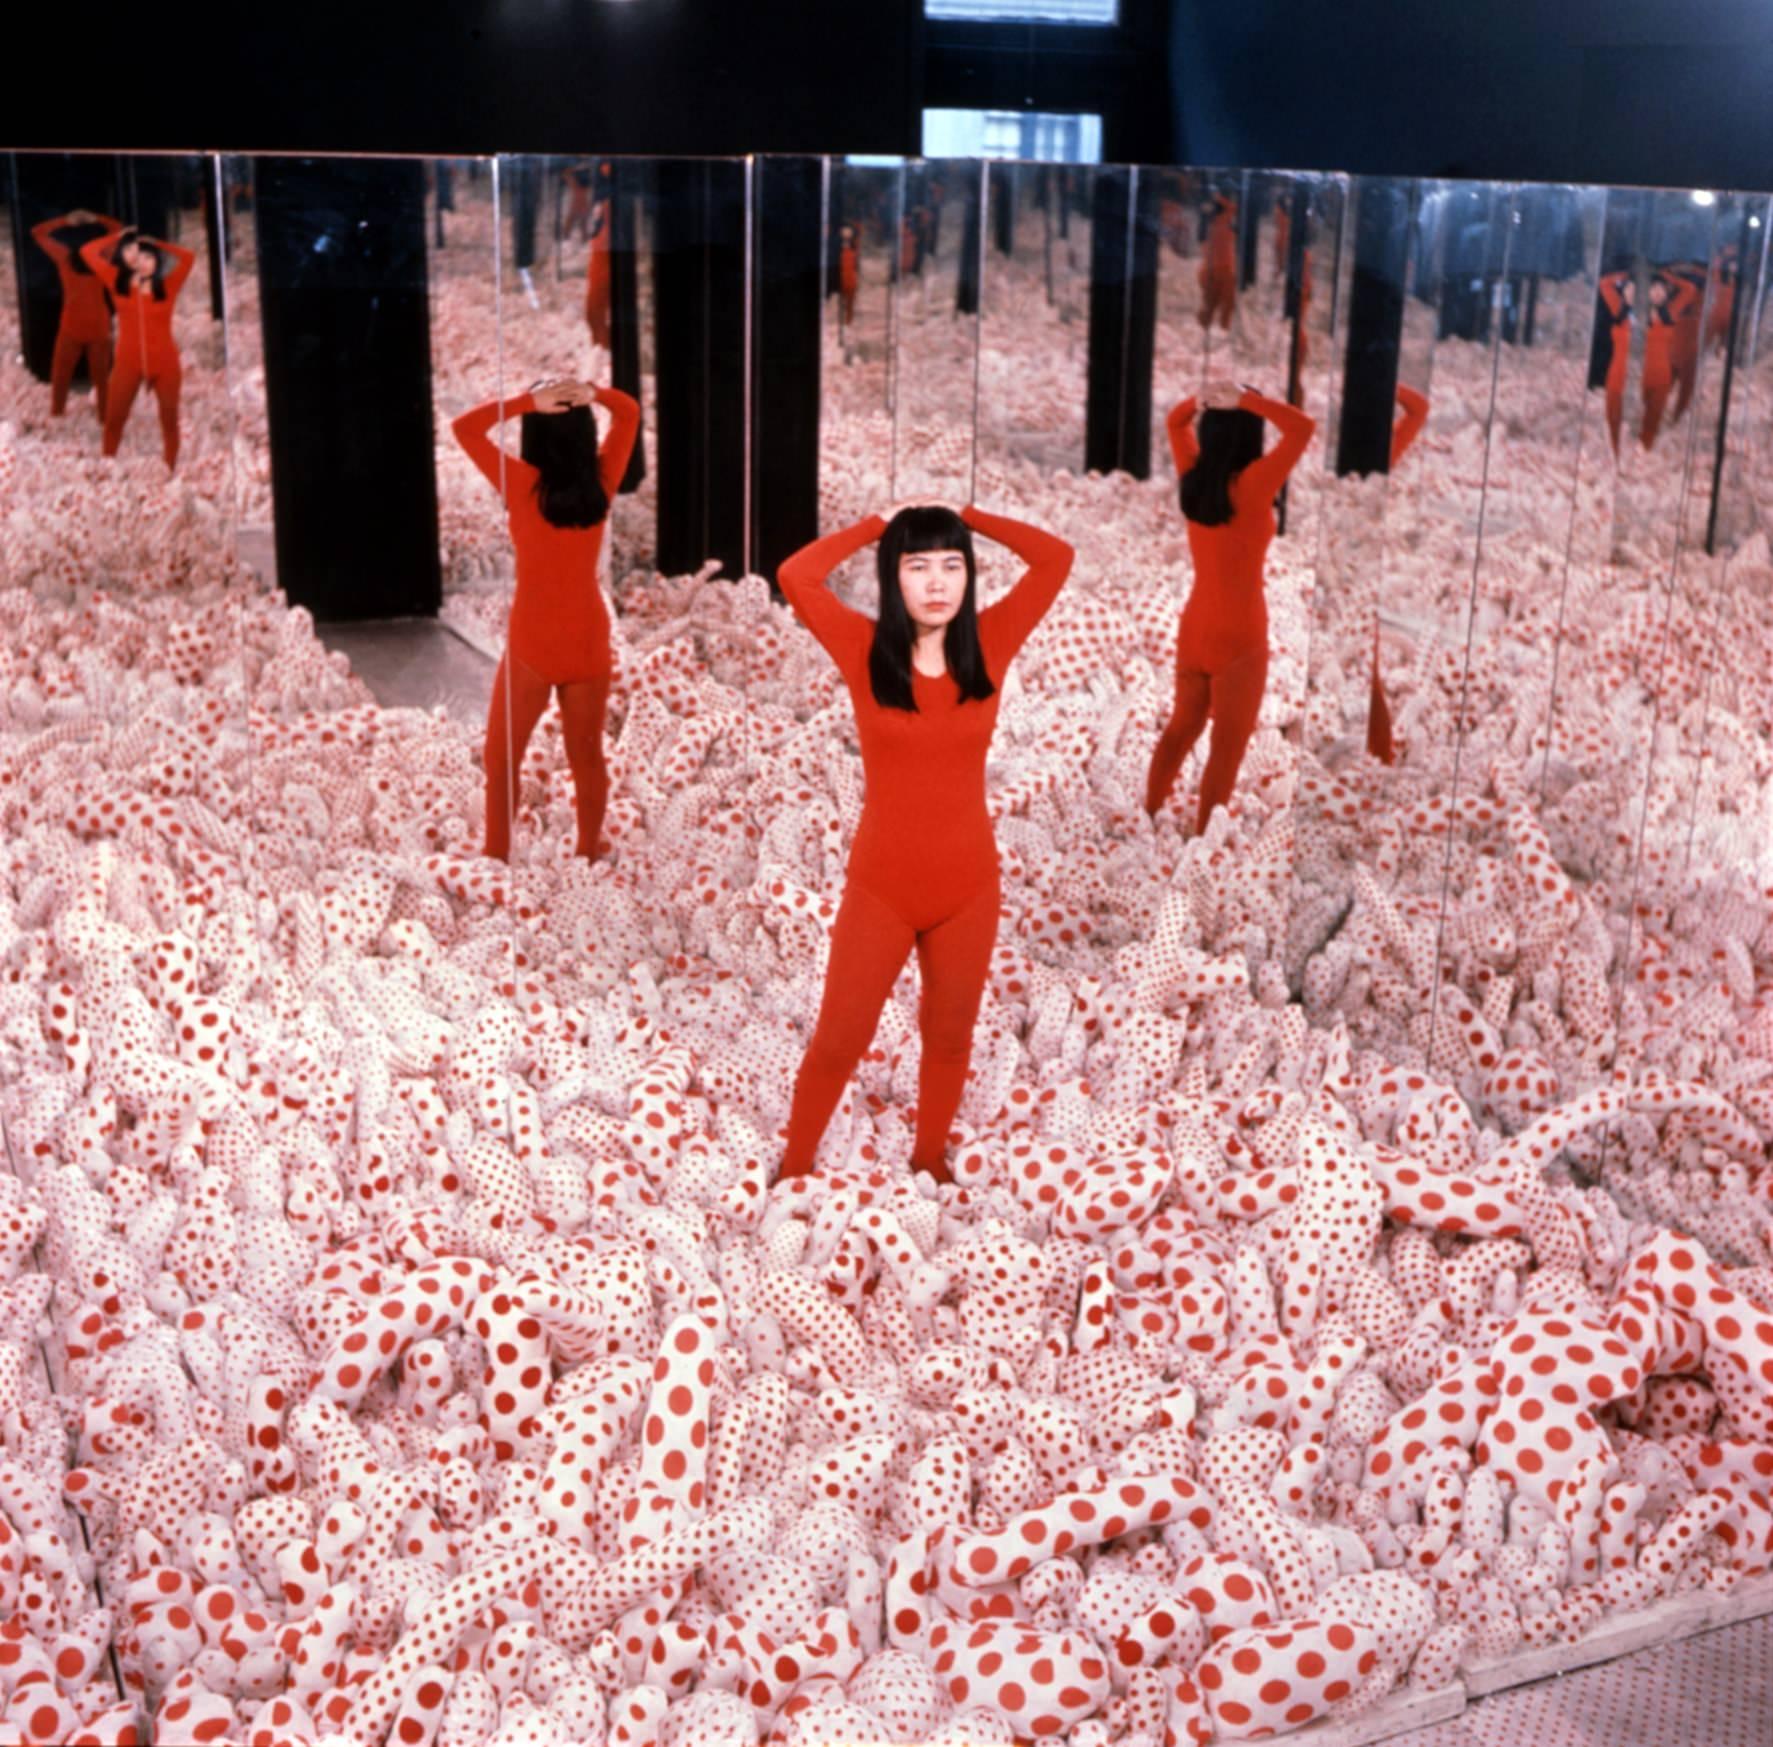 Yayoi Kusama   Infinity Mirror Room—Phalli's Field ,1965, in Floor Show, Castellane Gallery, New York, 1965 (Sewn stuffed cotton fabric, board, and mirrors) Courtesy of Ota Fine Arts, Tokyo/Singapore;Victoria Miro, London; David Zwirner, New York. © Yayoi Kusama Photo: Eikoh Hosoe